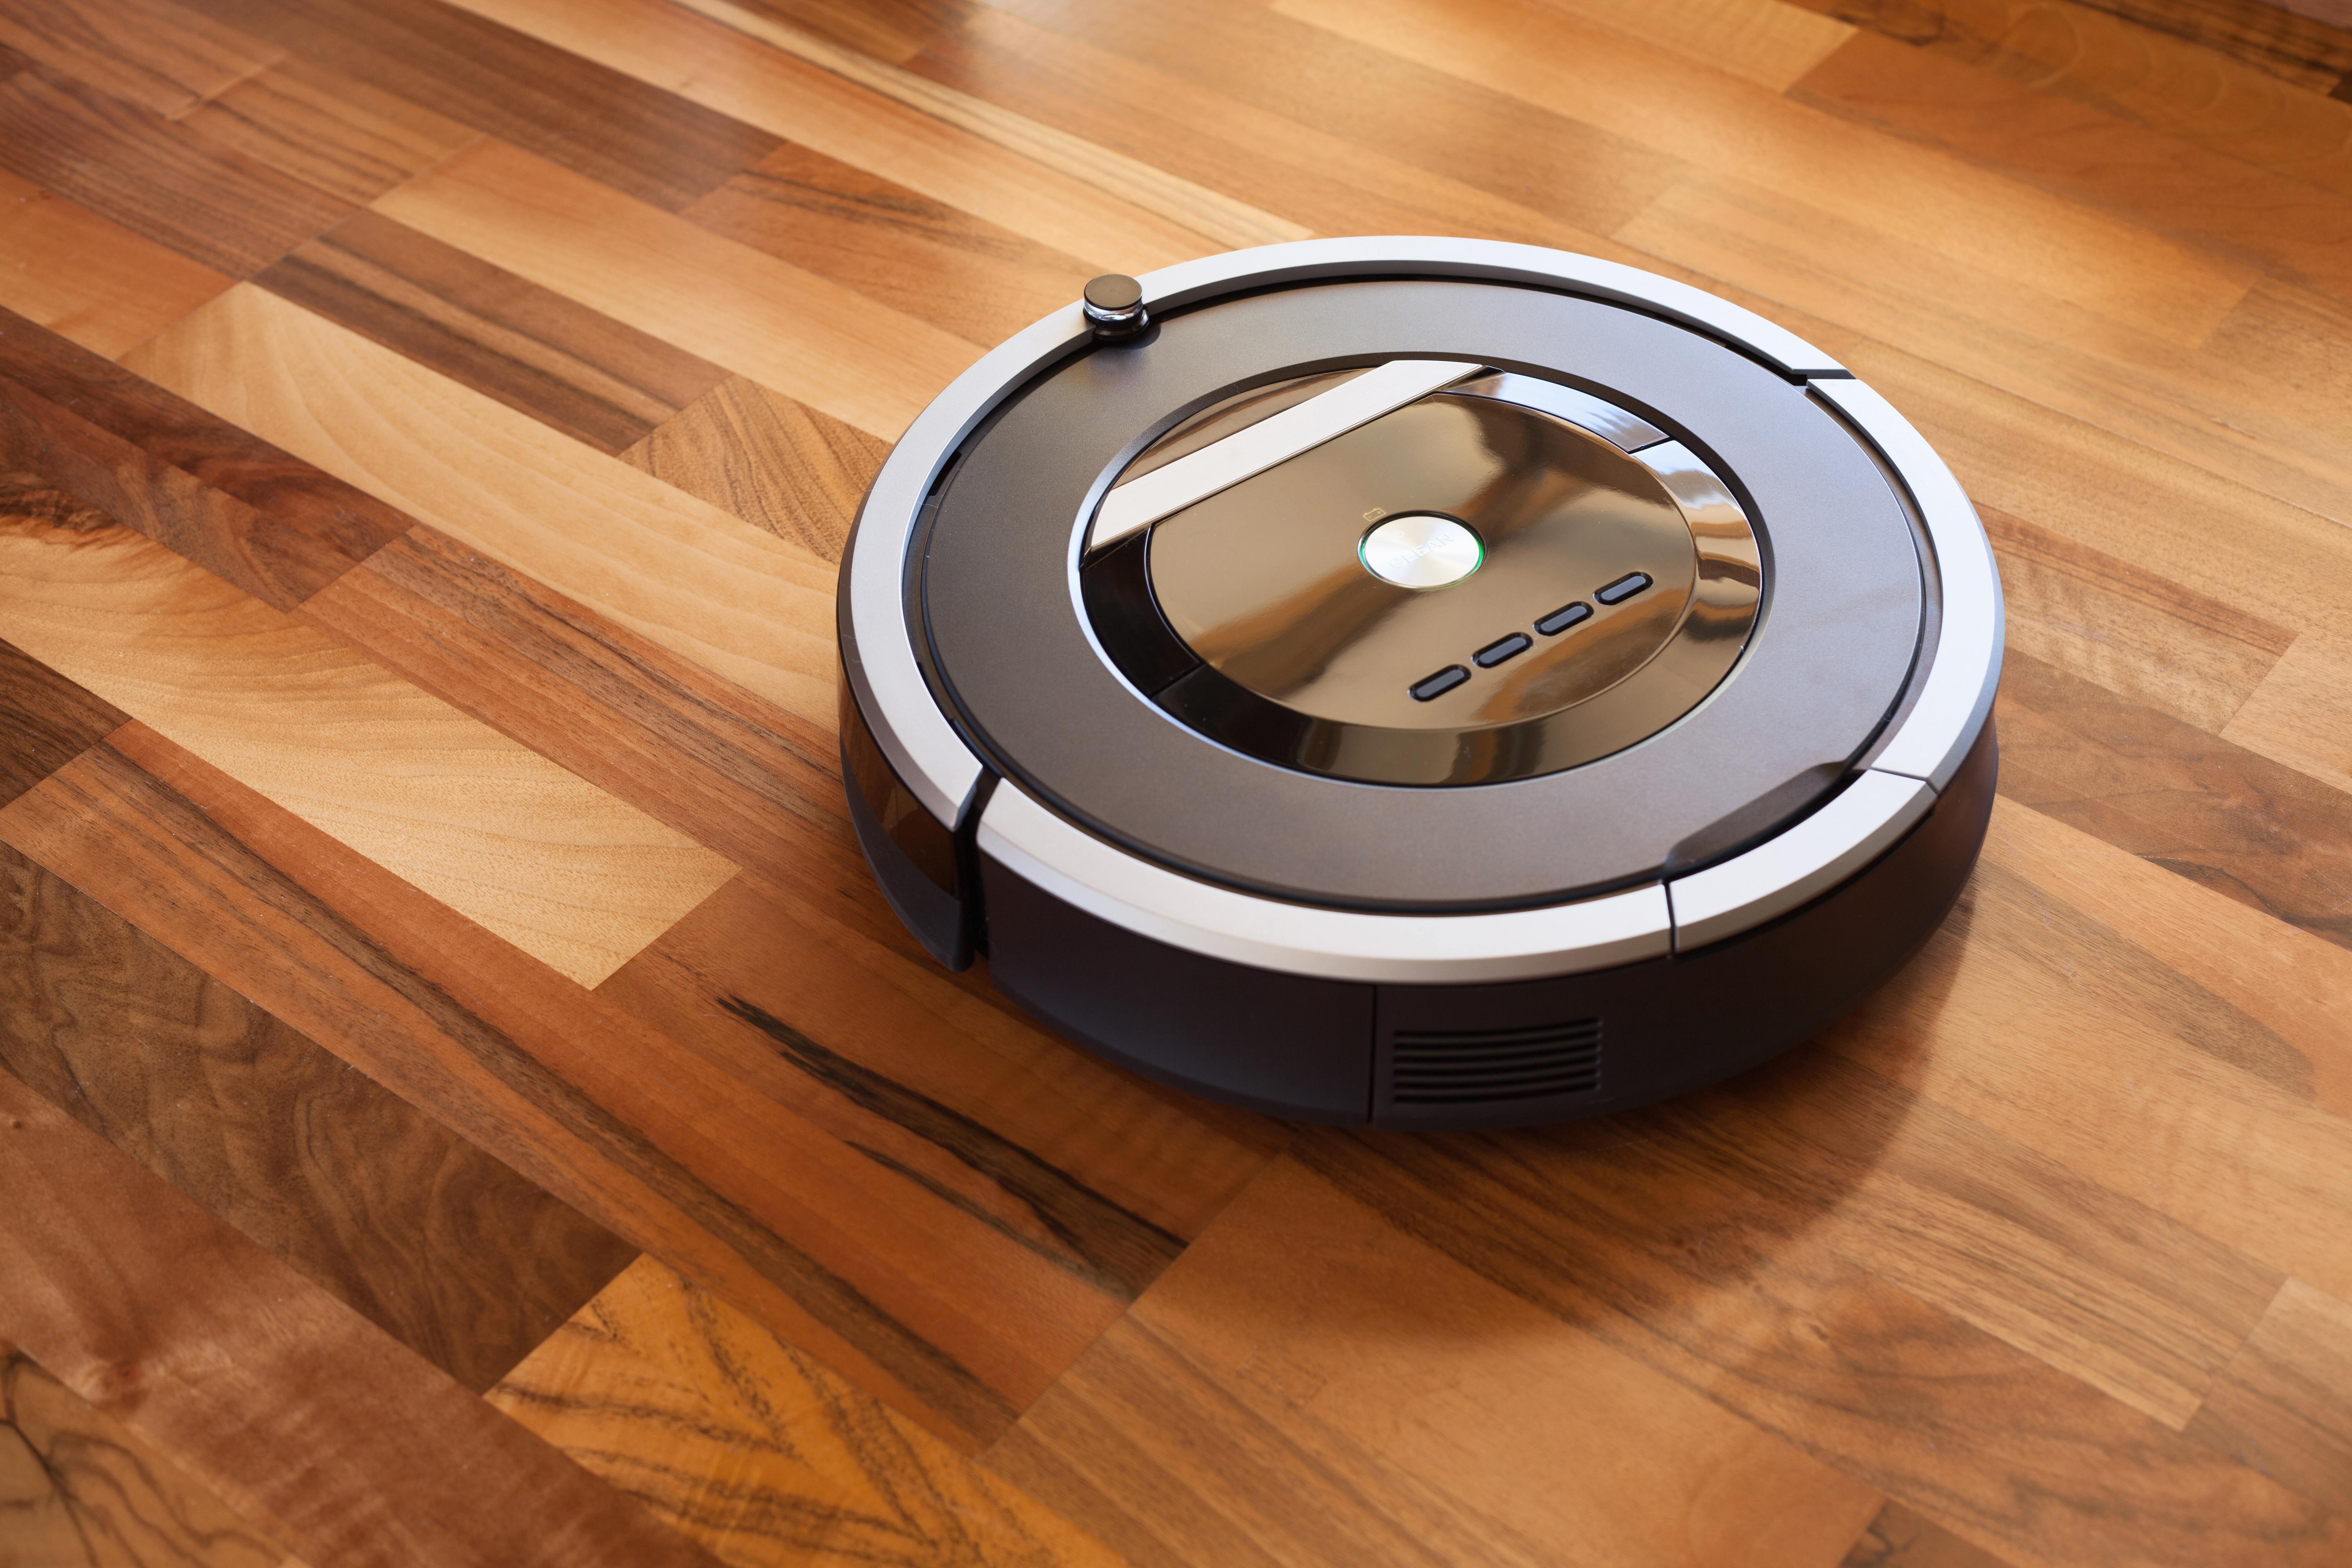 Robotic vacuum cleaner on a hardwood floor.